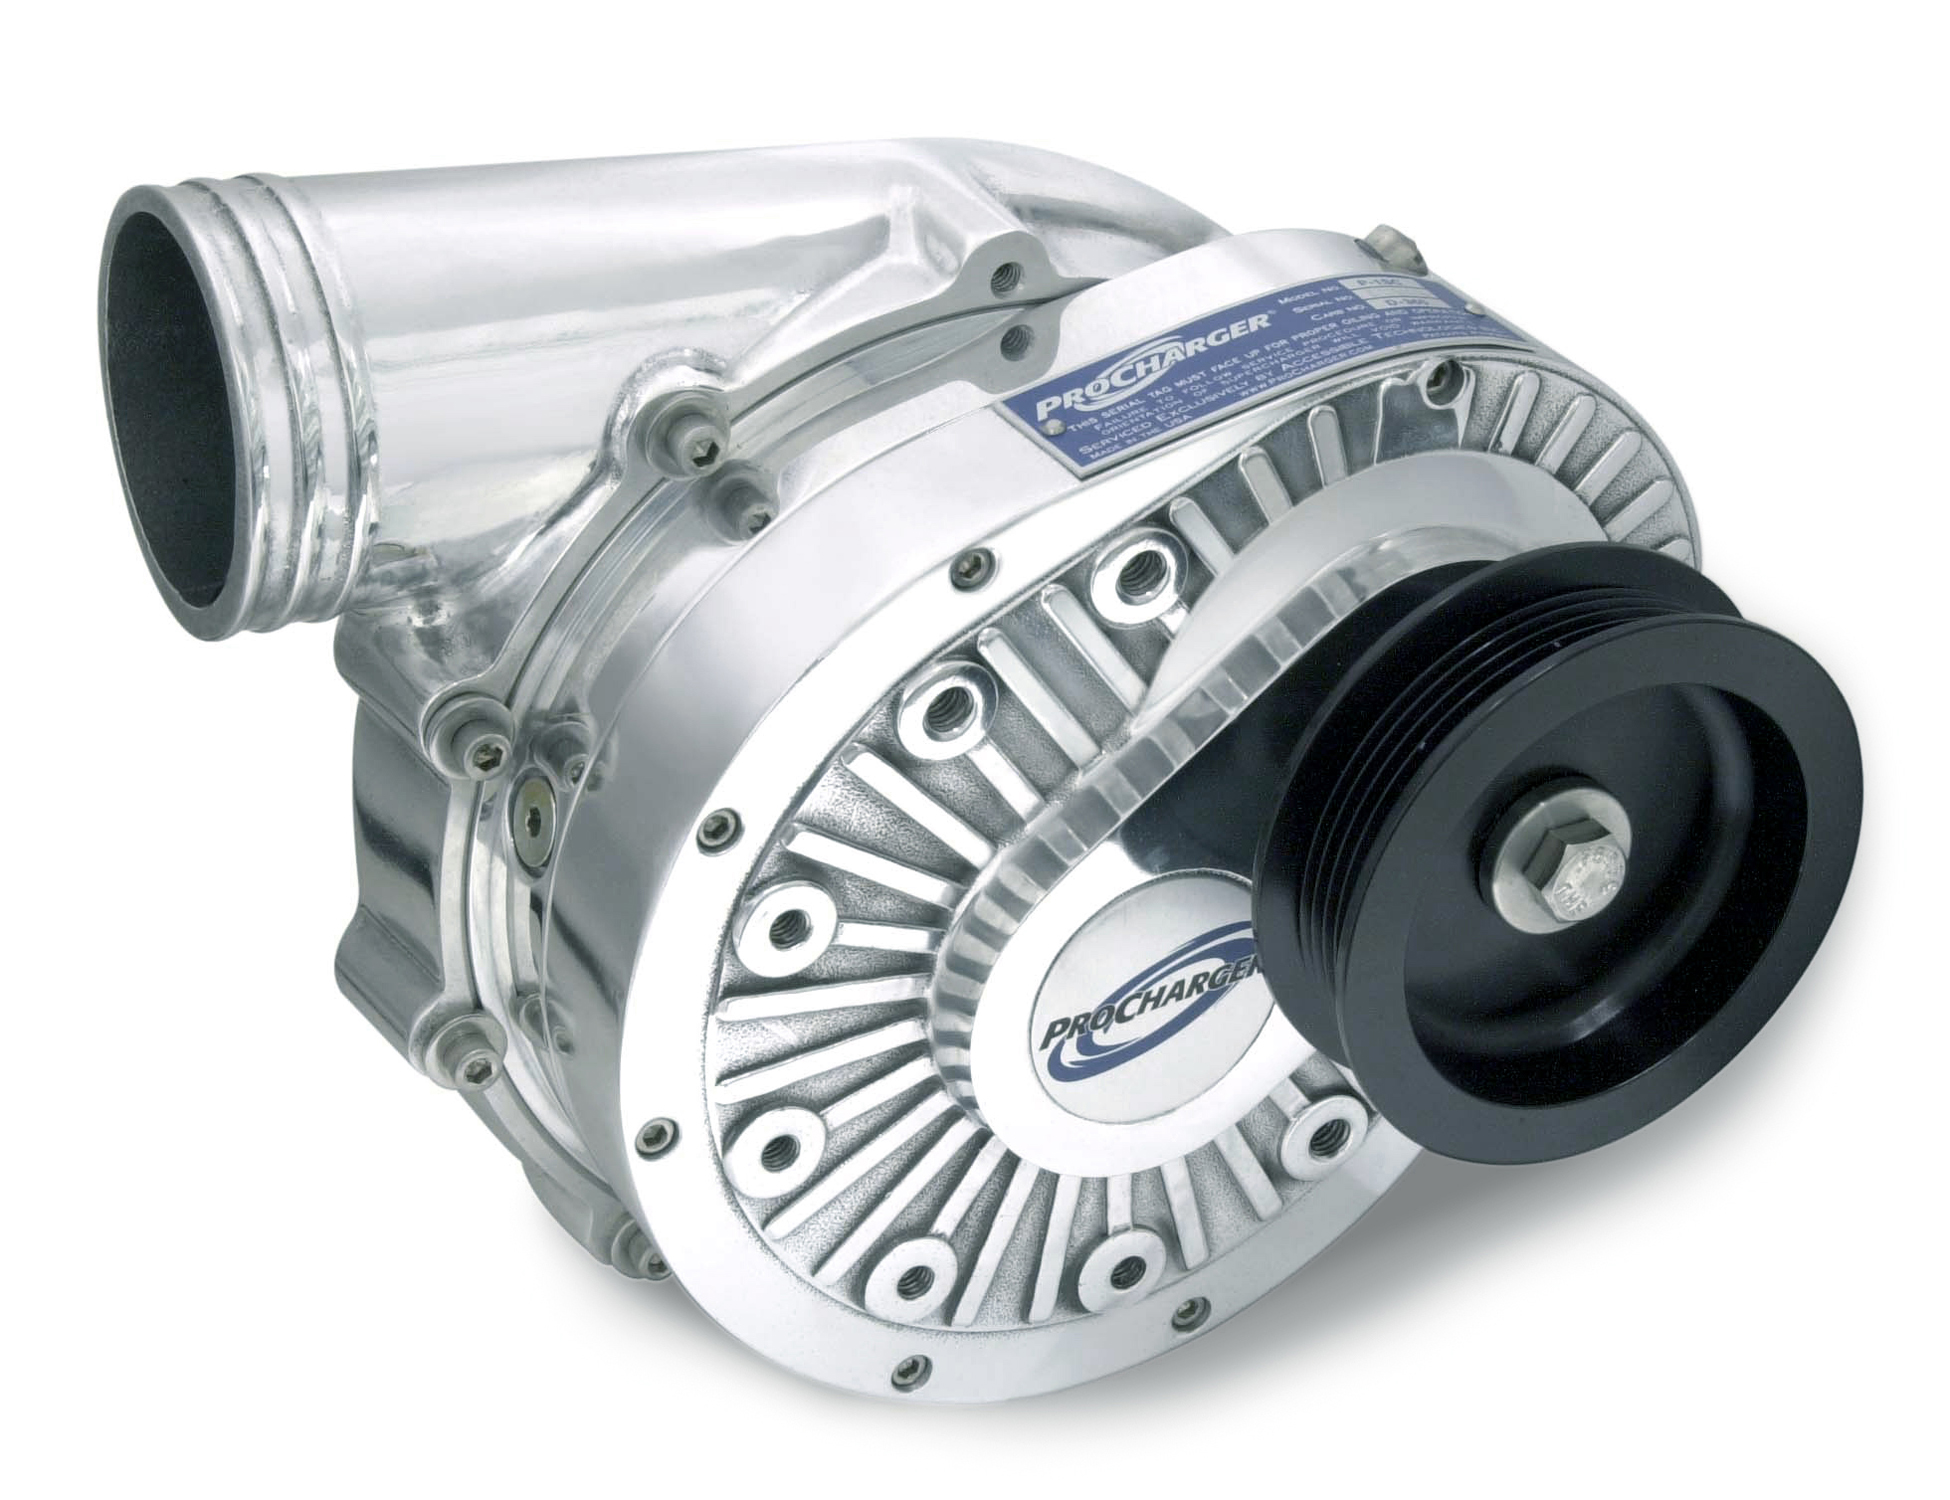 Ati Procharger Pontiac Kits Big Block Engines